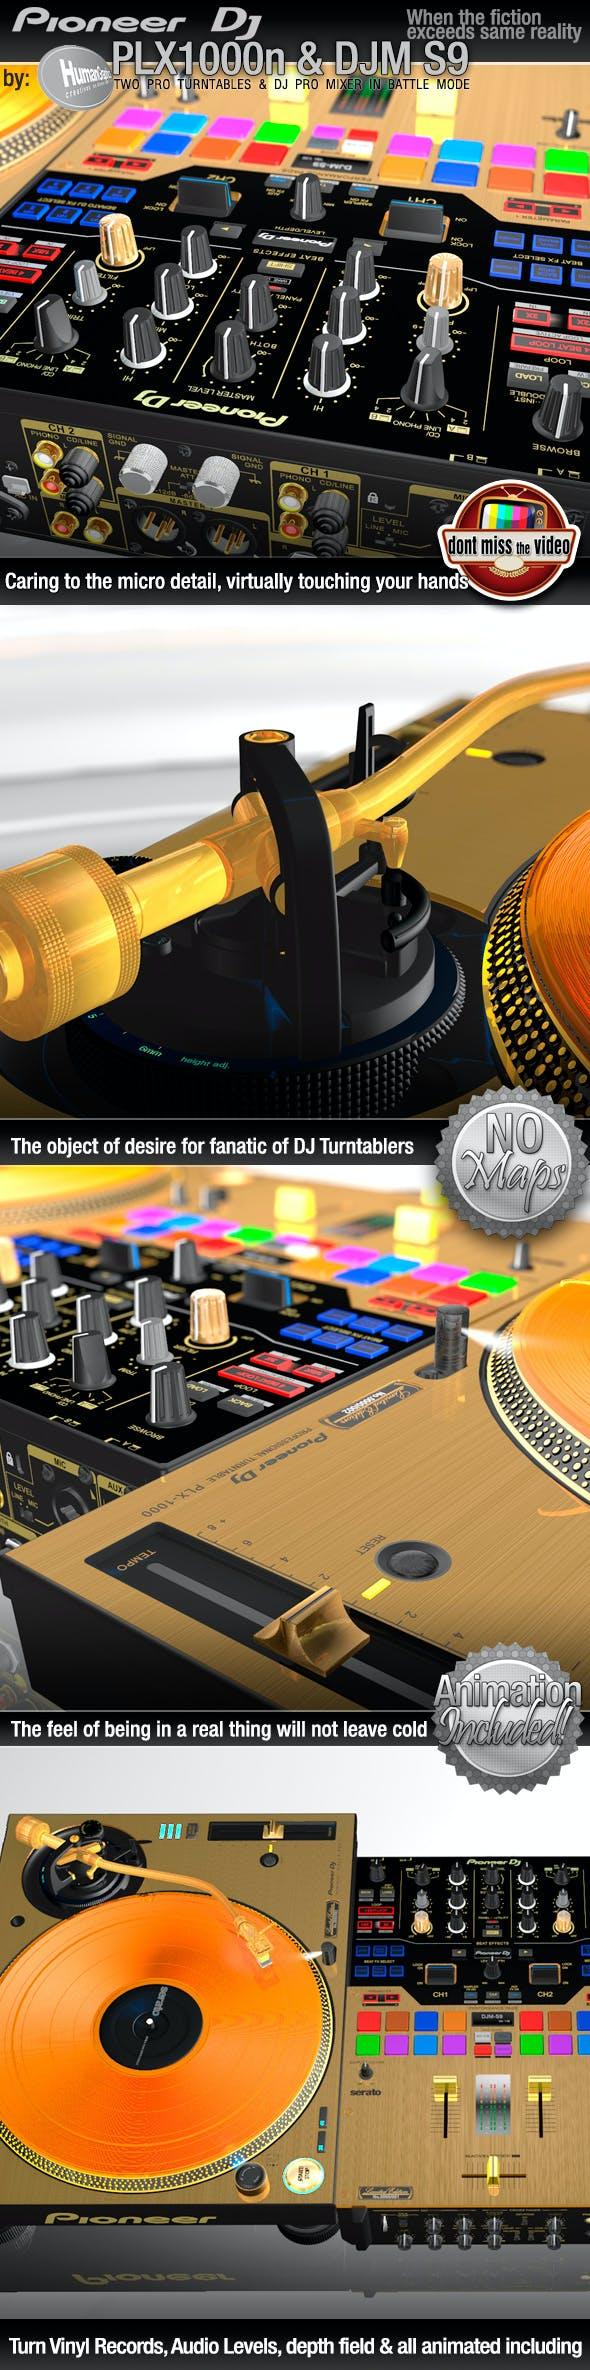 Realistic Gold ProDJ Turntable Pioneer PLX1000 & Mixer DJM S9 Vinyl Turntabilism - 3DOcean Item for Sale